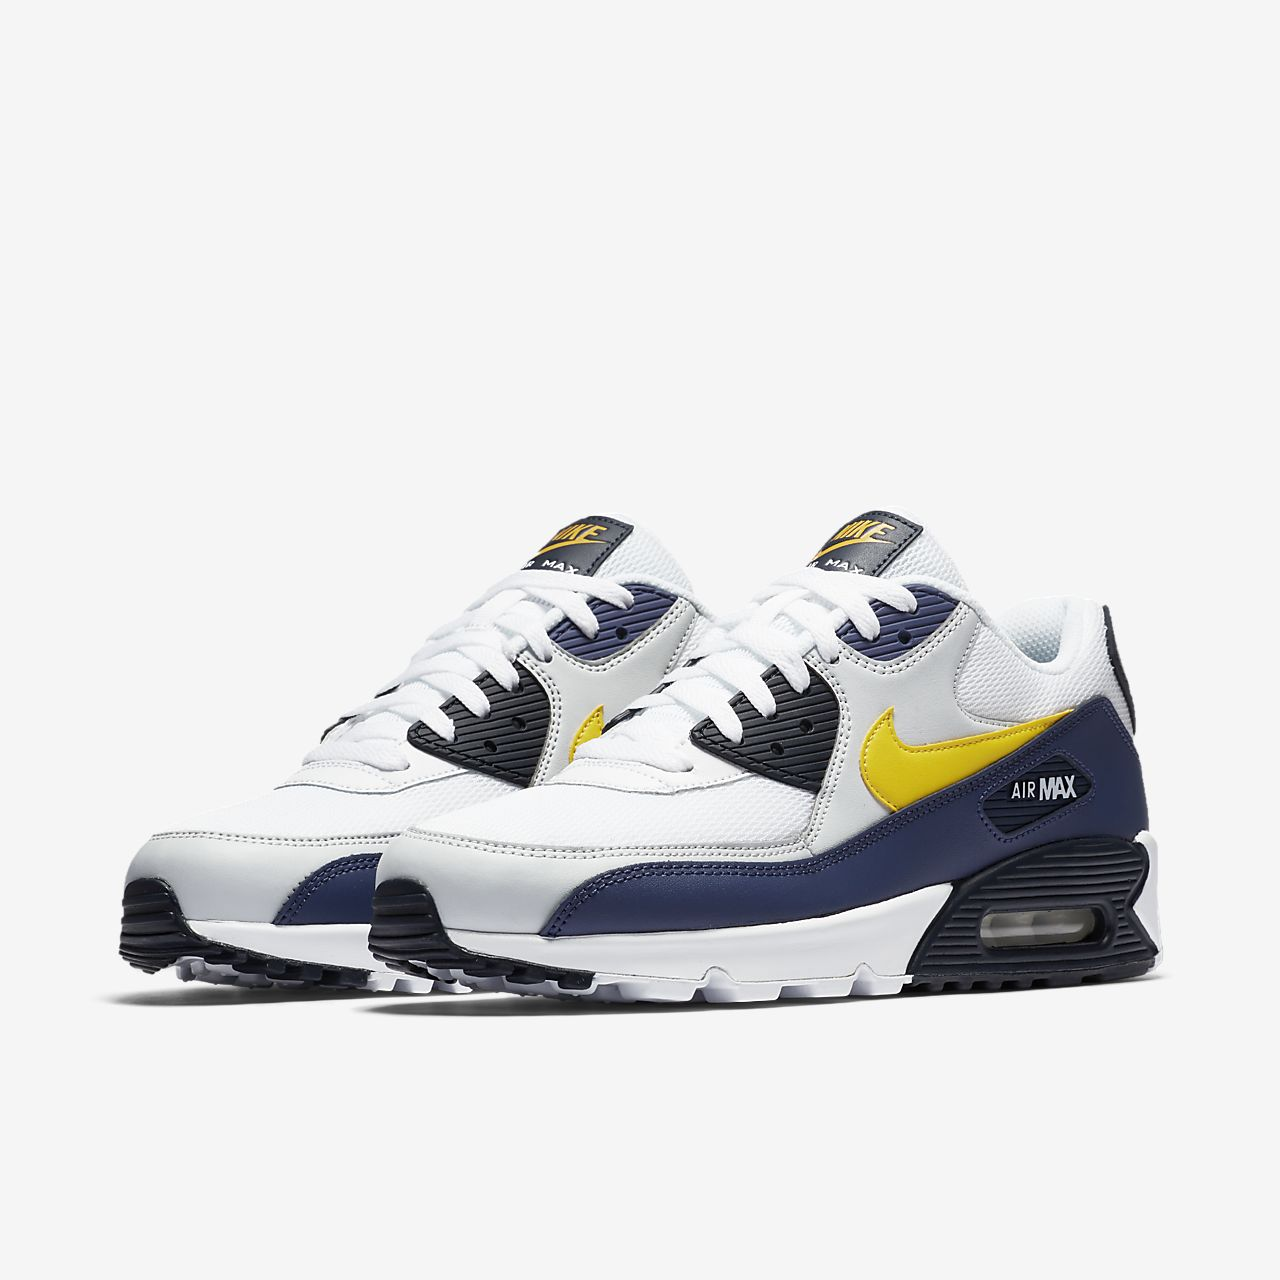 Nike Air Max 90 Hommes Bleu Et Blanc Chaussures Habillées